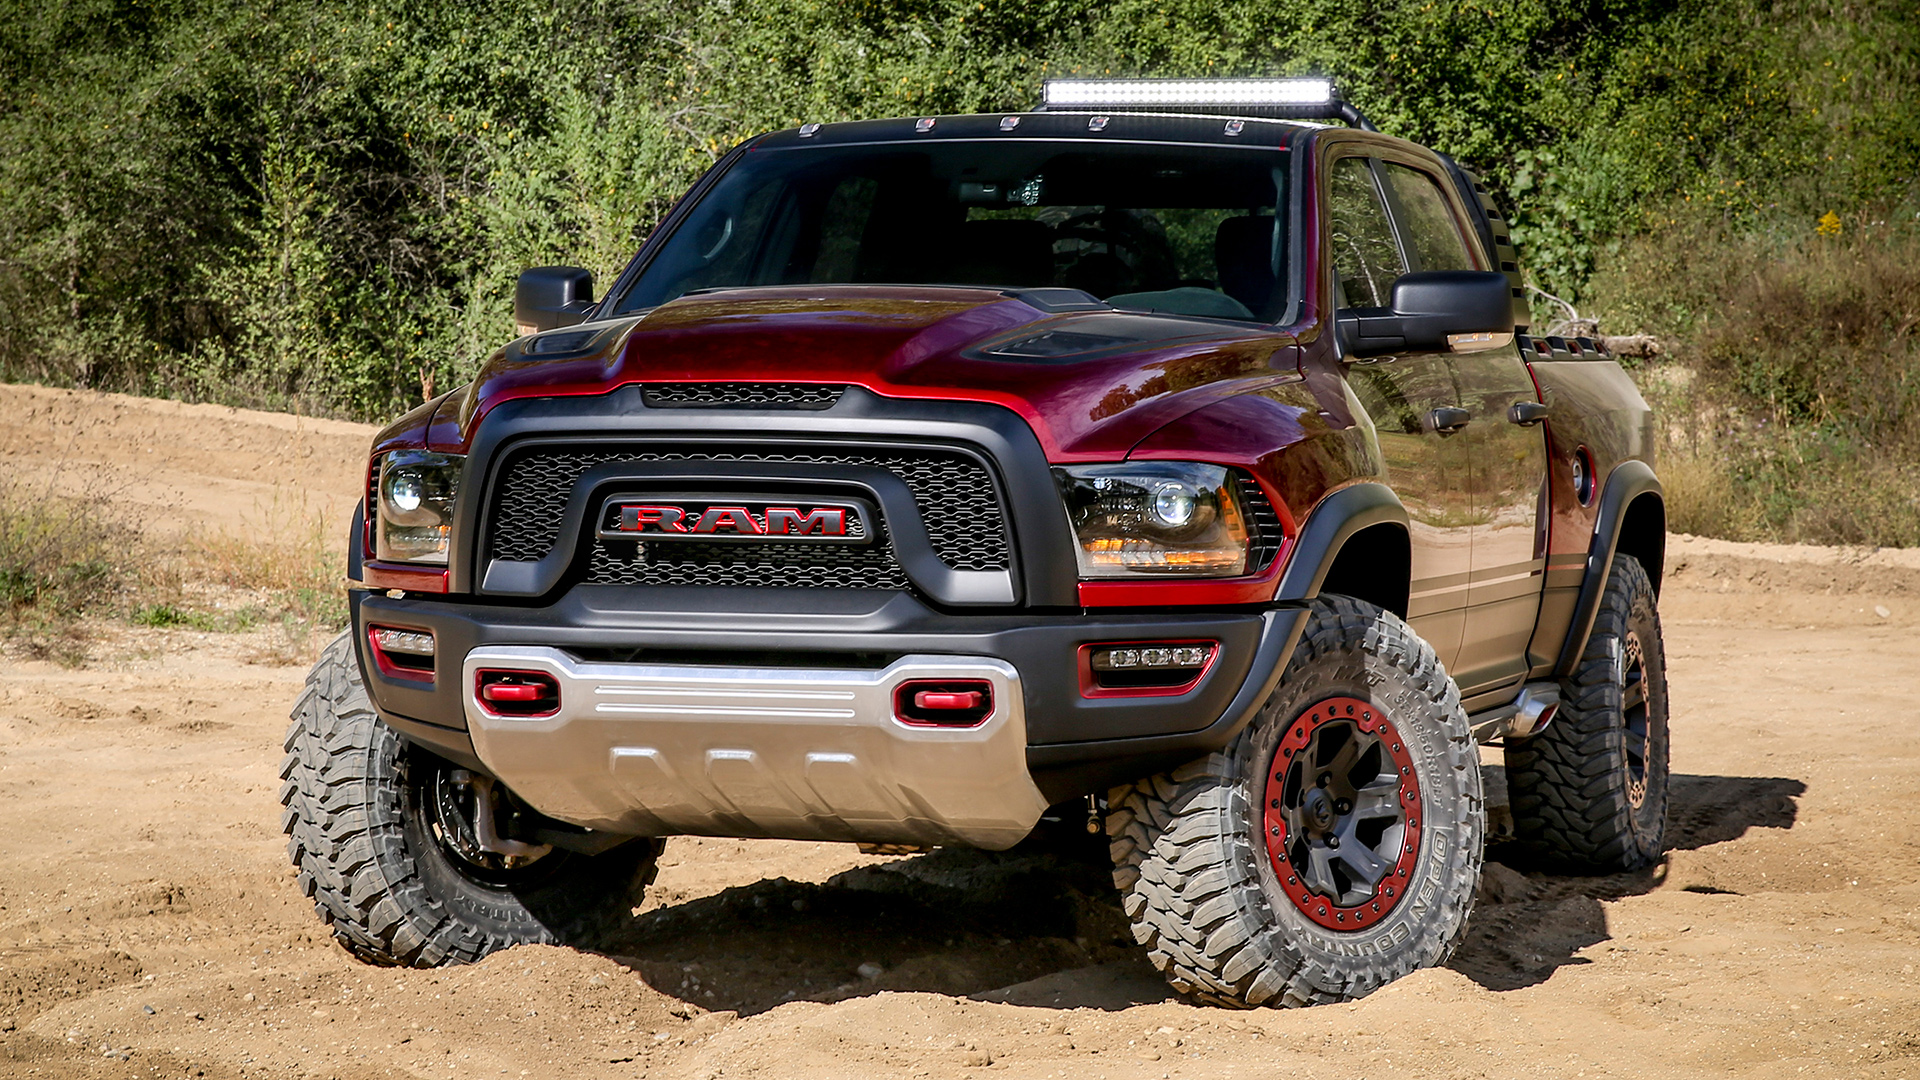 The Hellcat-Powered Ram Rebel TRX Concept Truck Is a 575-HP Monster